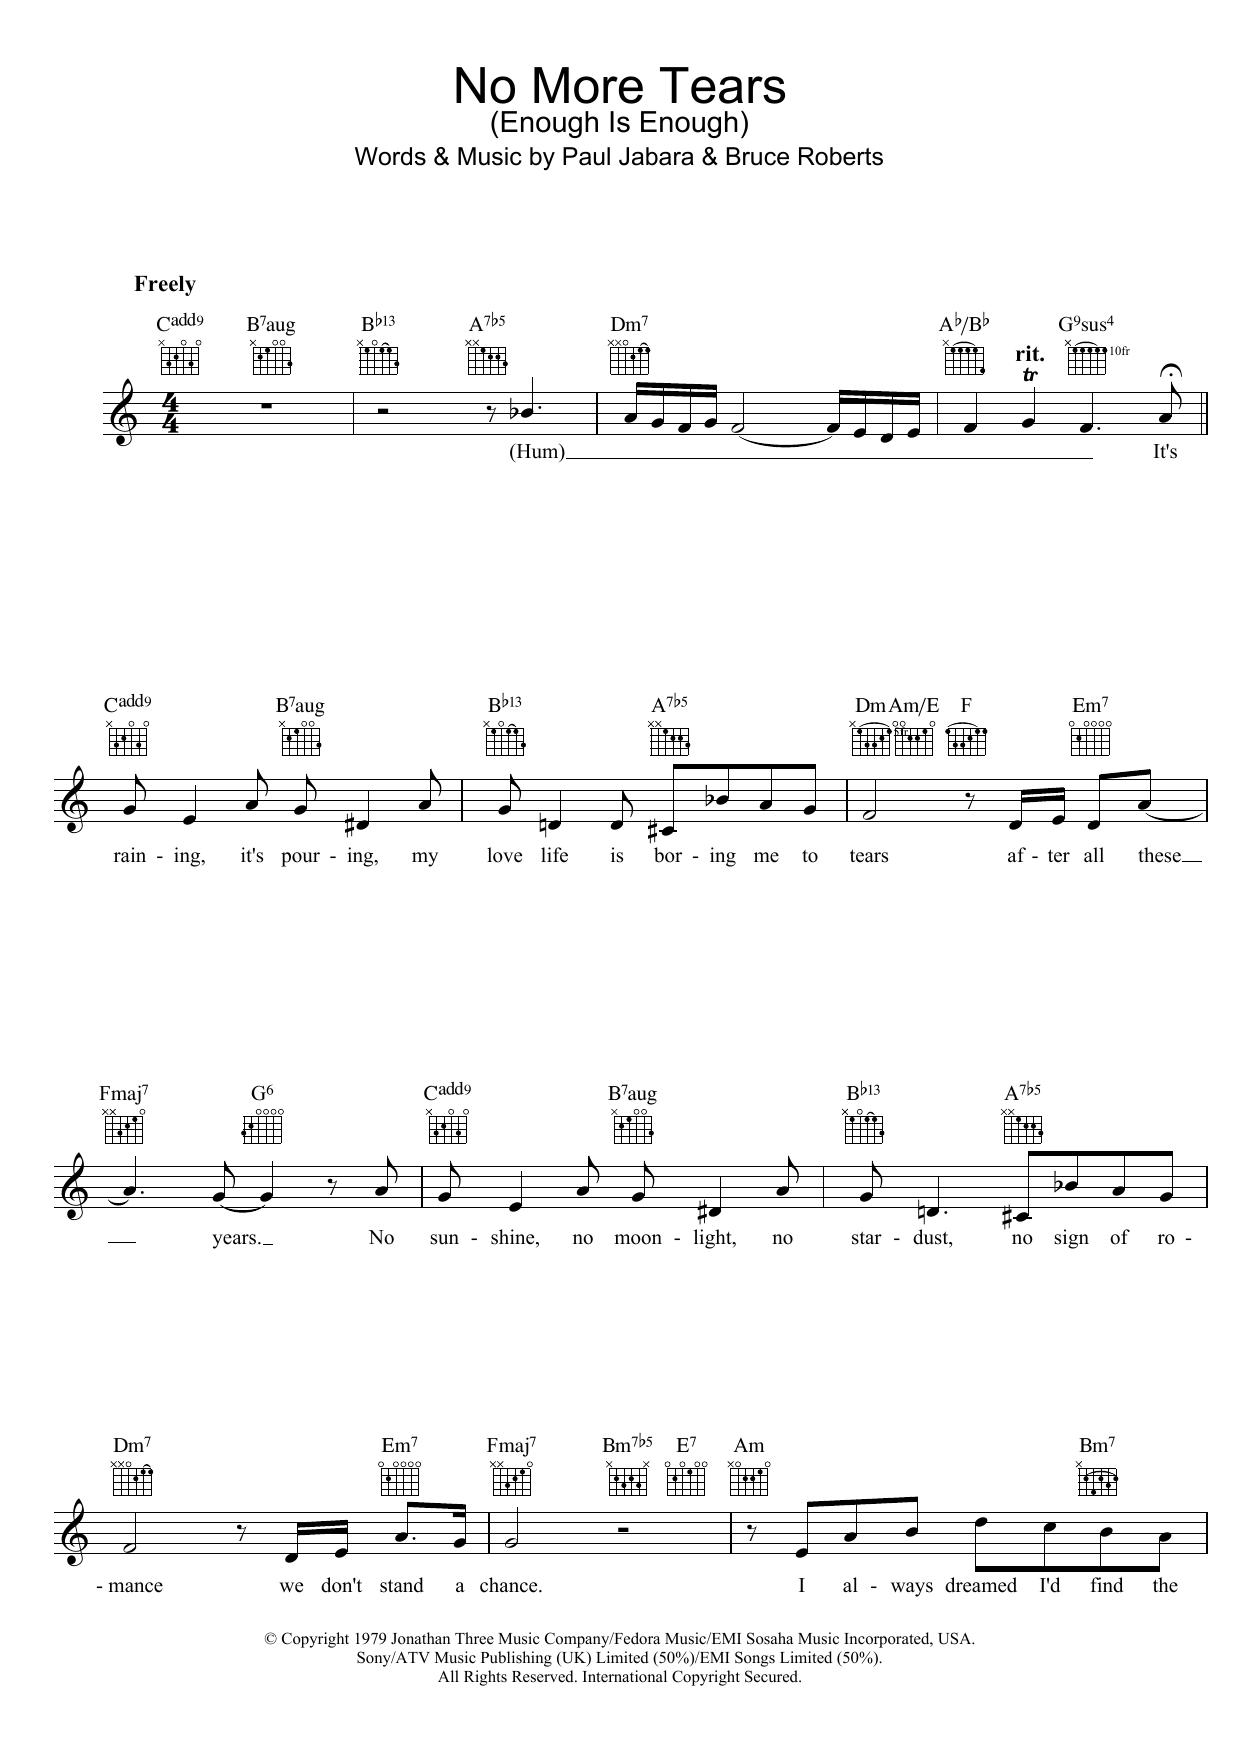 No More Tears (Enough Is Enough) Sheet Music